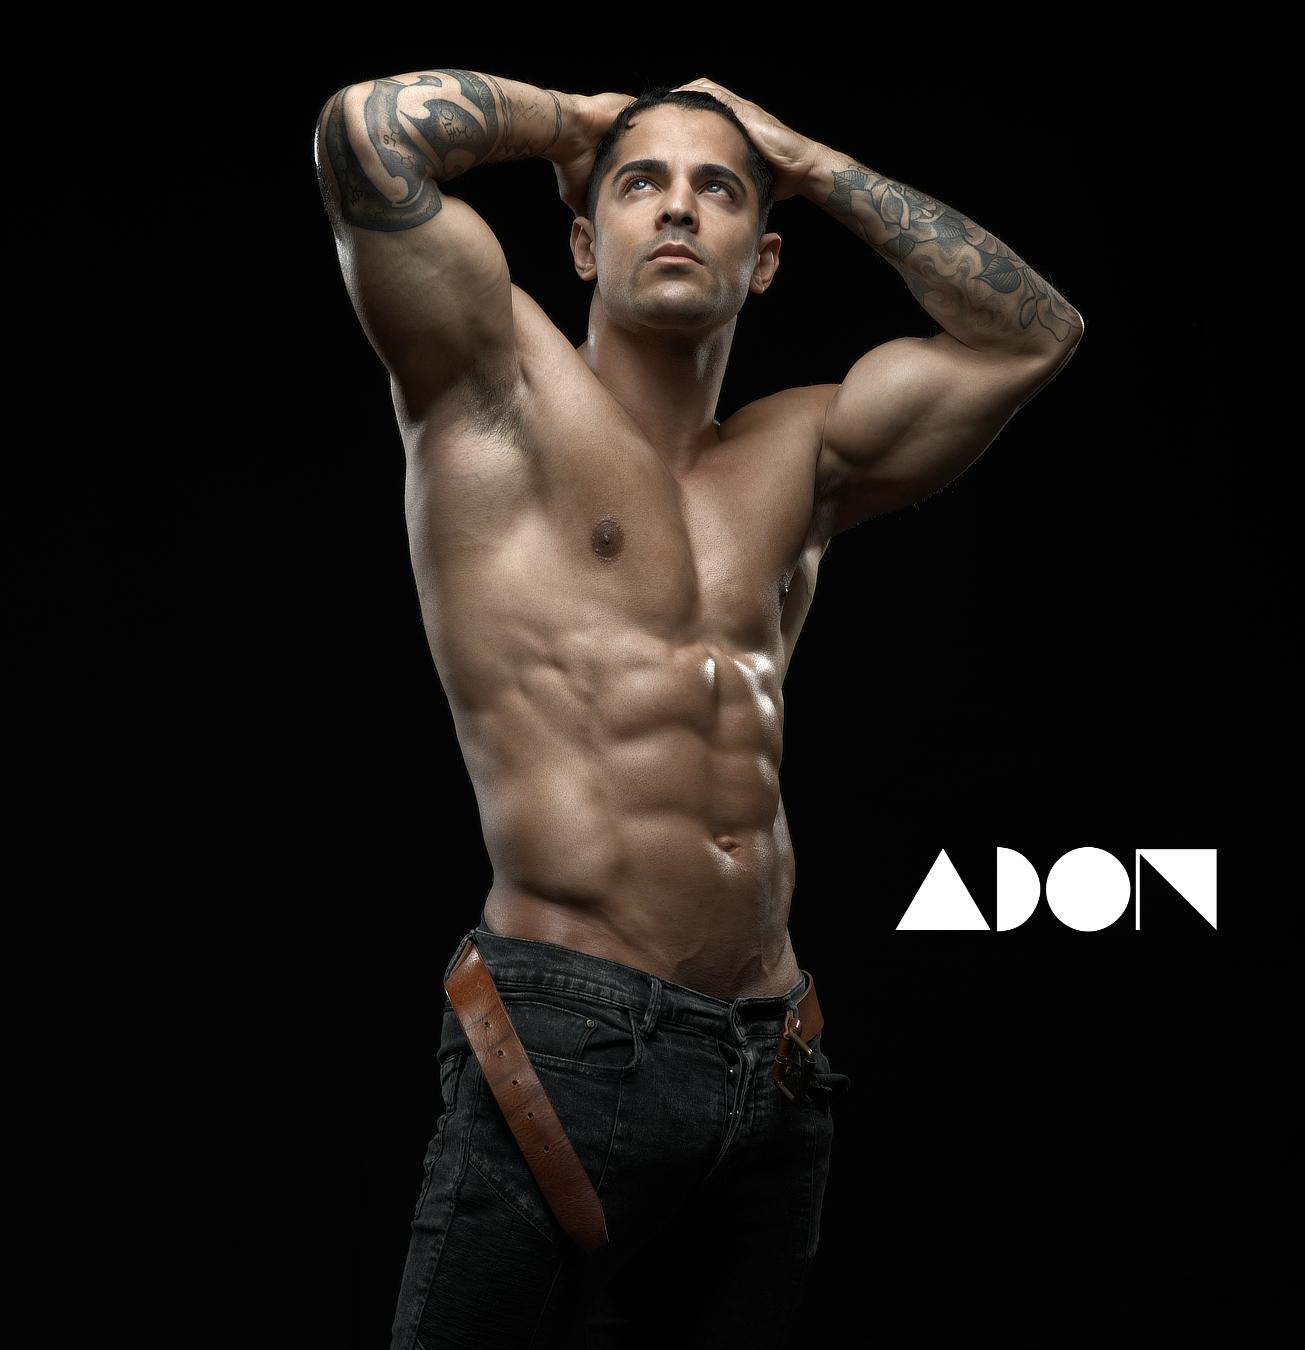 Adon Exclusive: Model Samuel Shimi By Paul Jamnicky